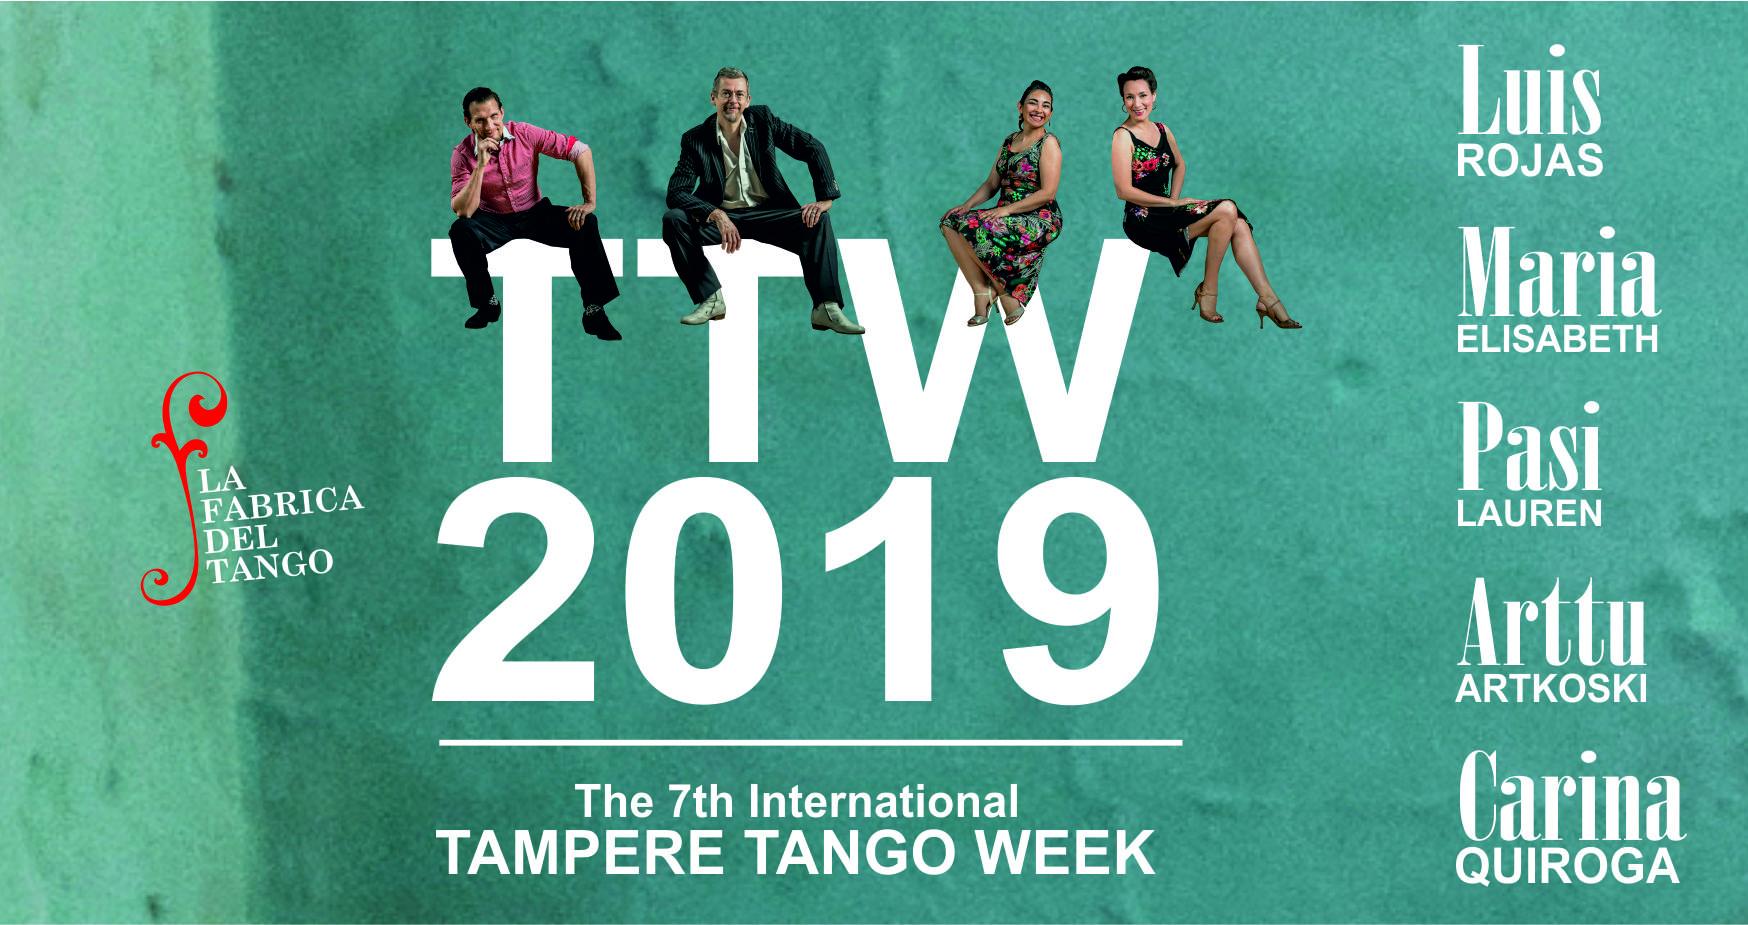 La T2 tango workshop